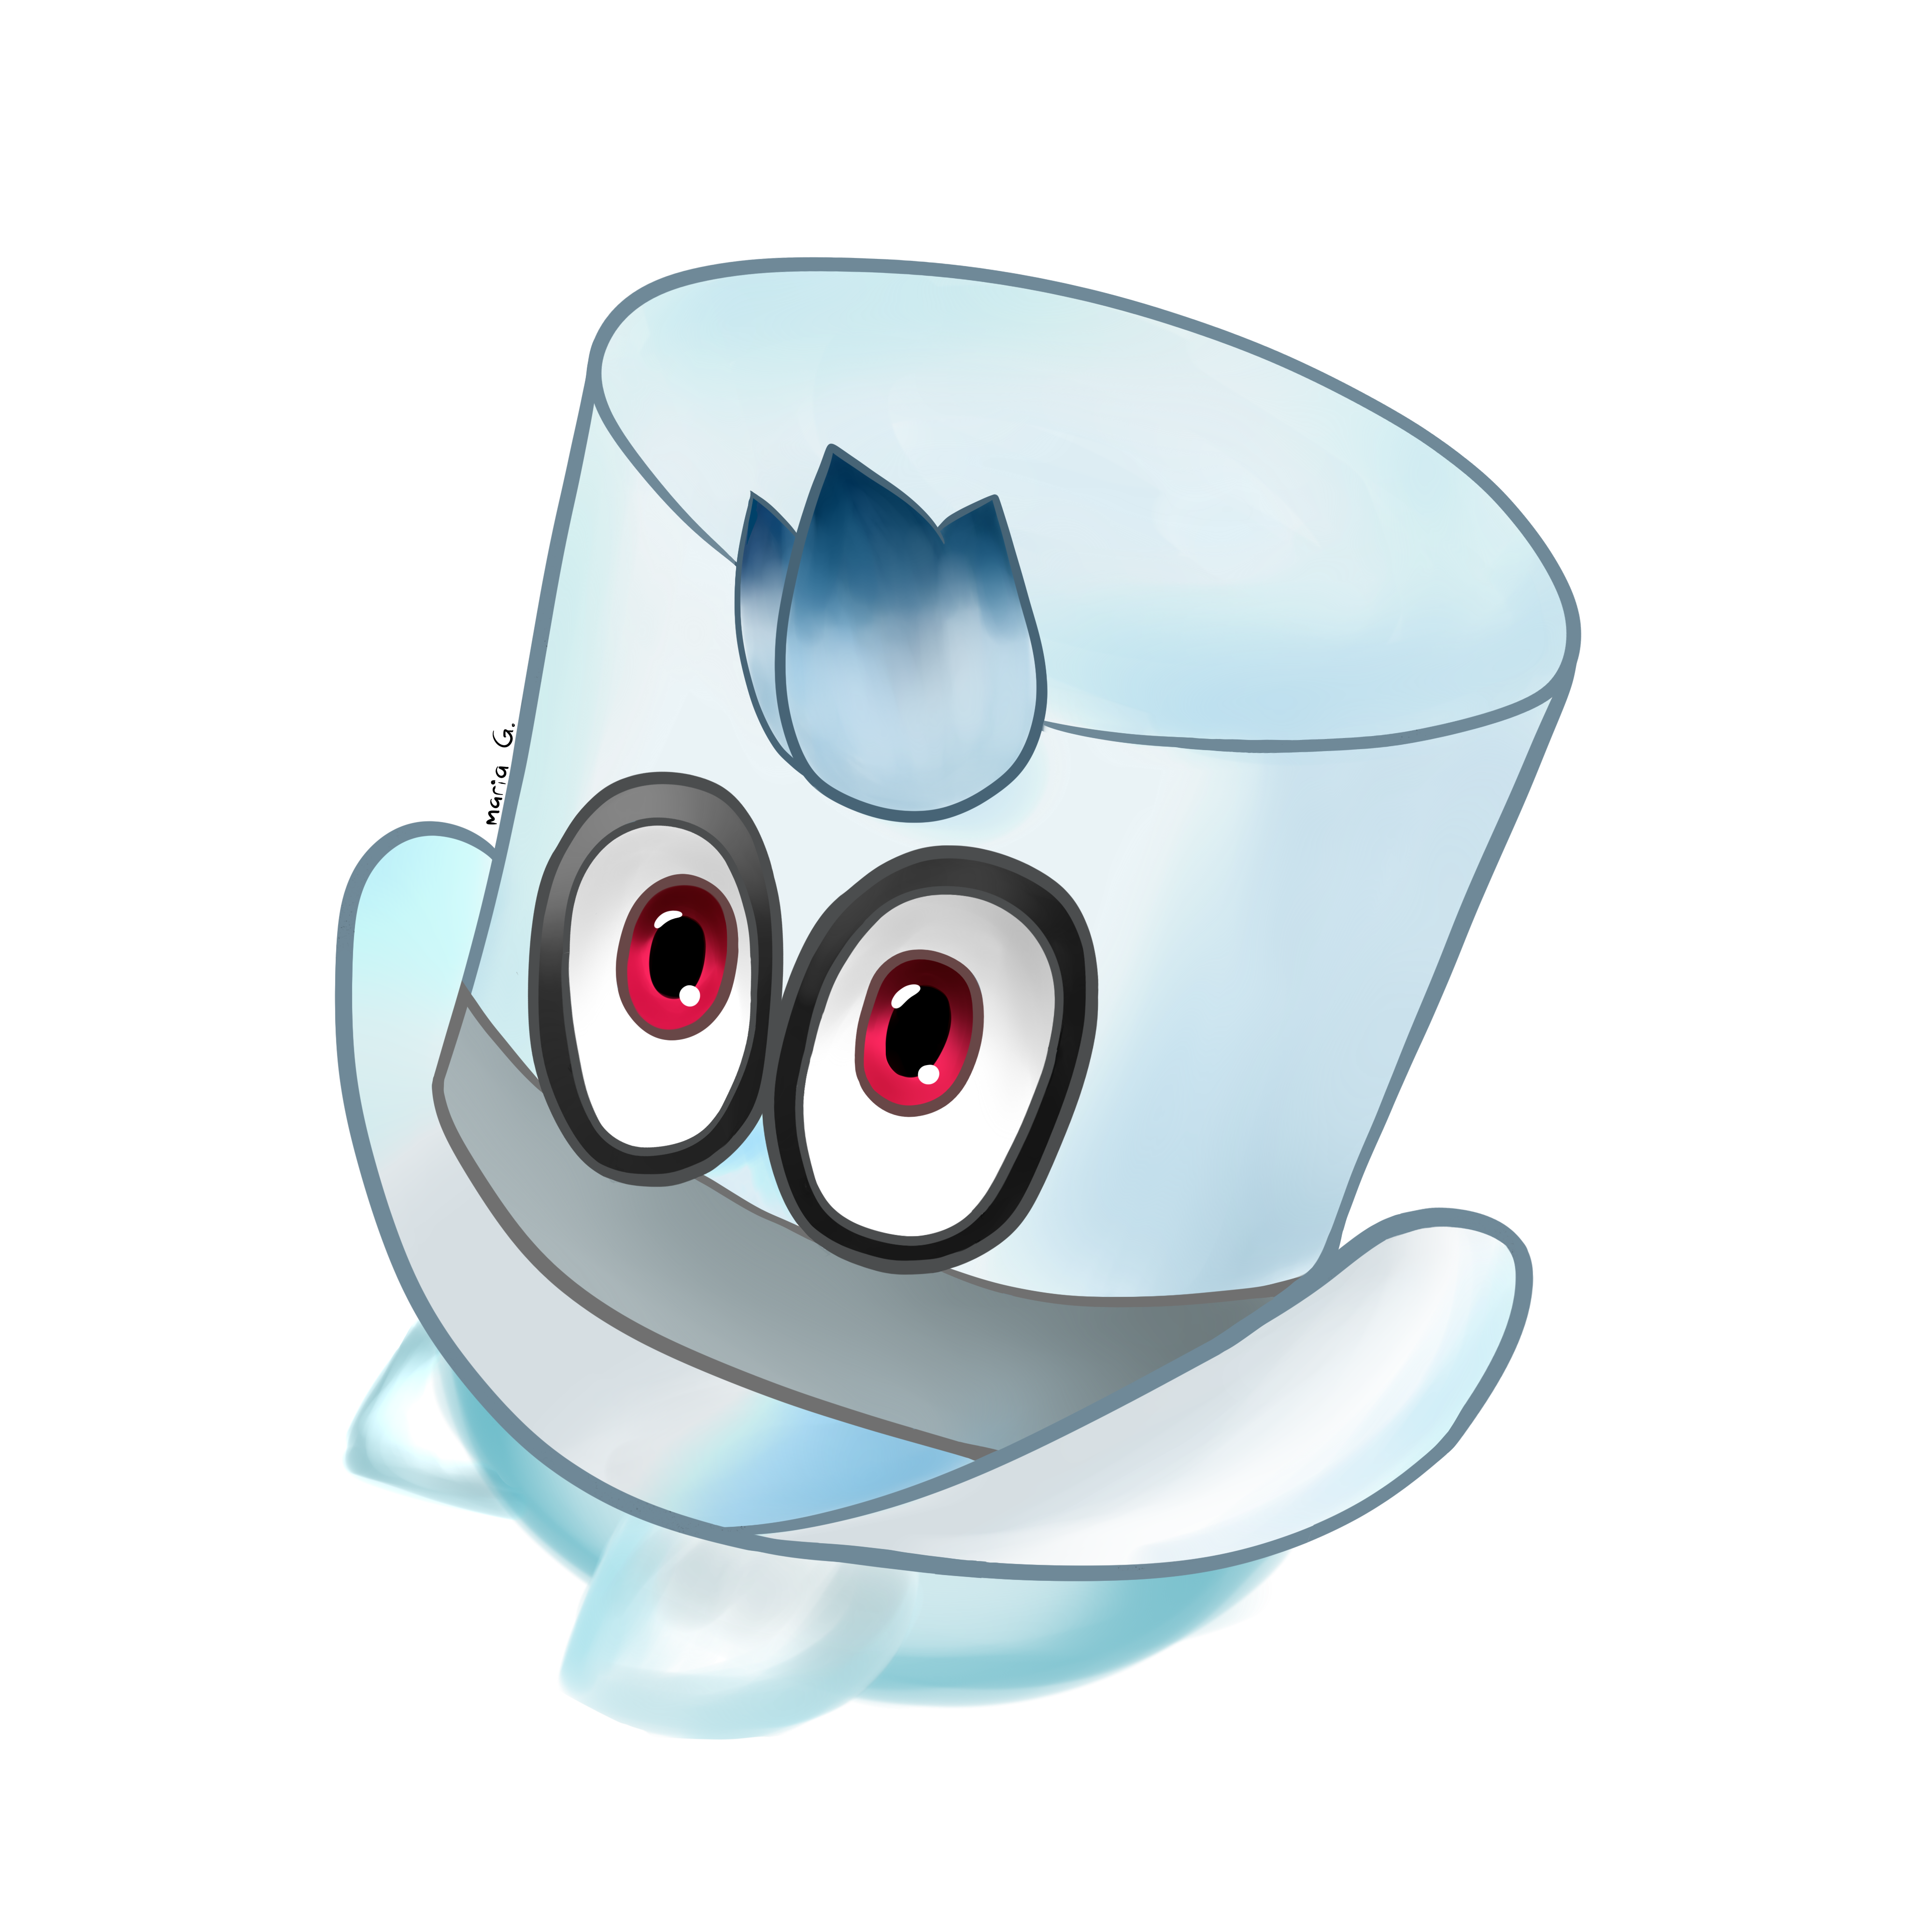 Cappy Super Mario Odyssey By Mariag2002 On Deviantart